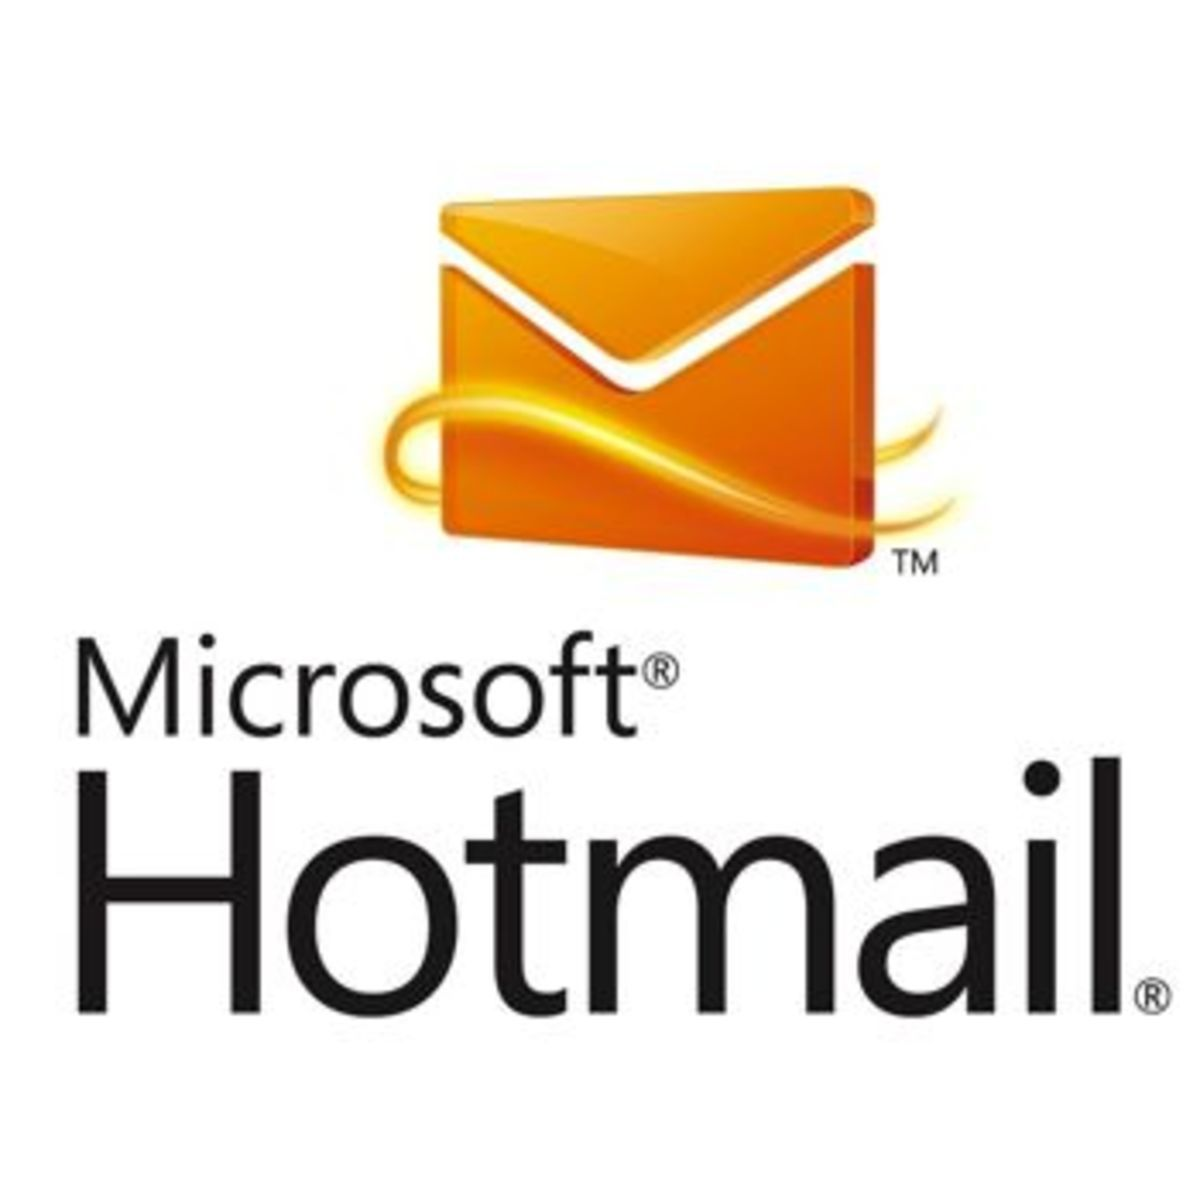 Marketing Mix Of Hotmail